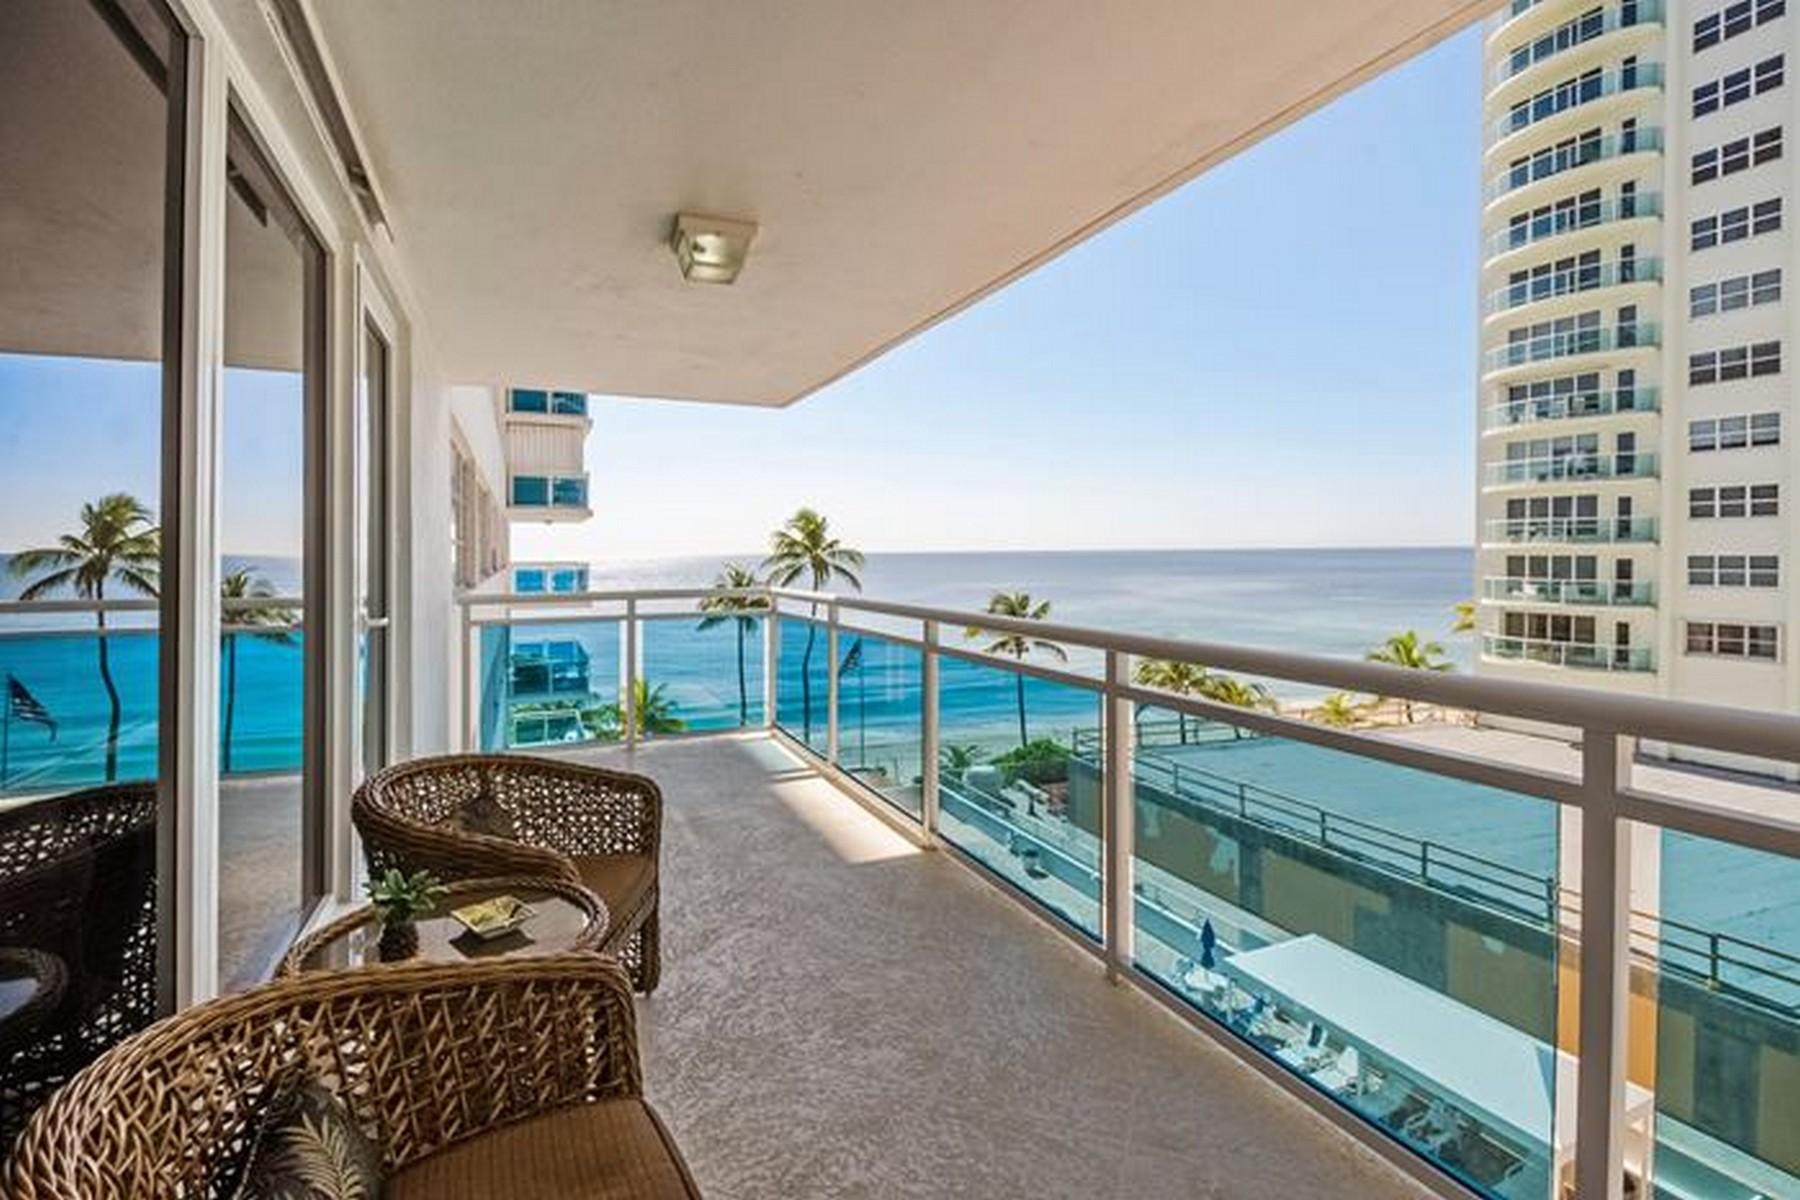 Apartment for Sale at 3430 Galt Ocean Dr #508 Fort Lauderdale, Florida 33308 United States